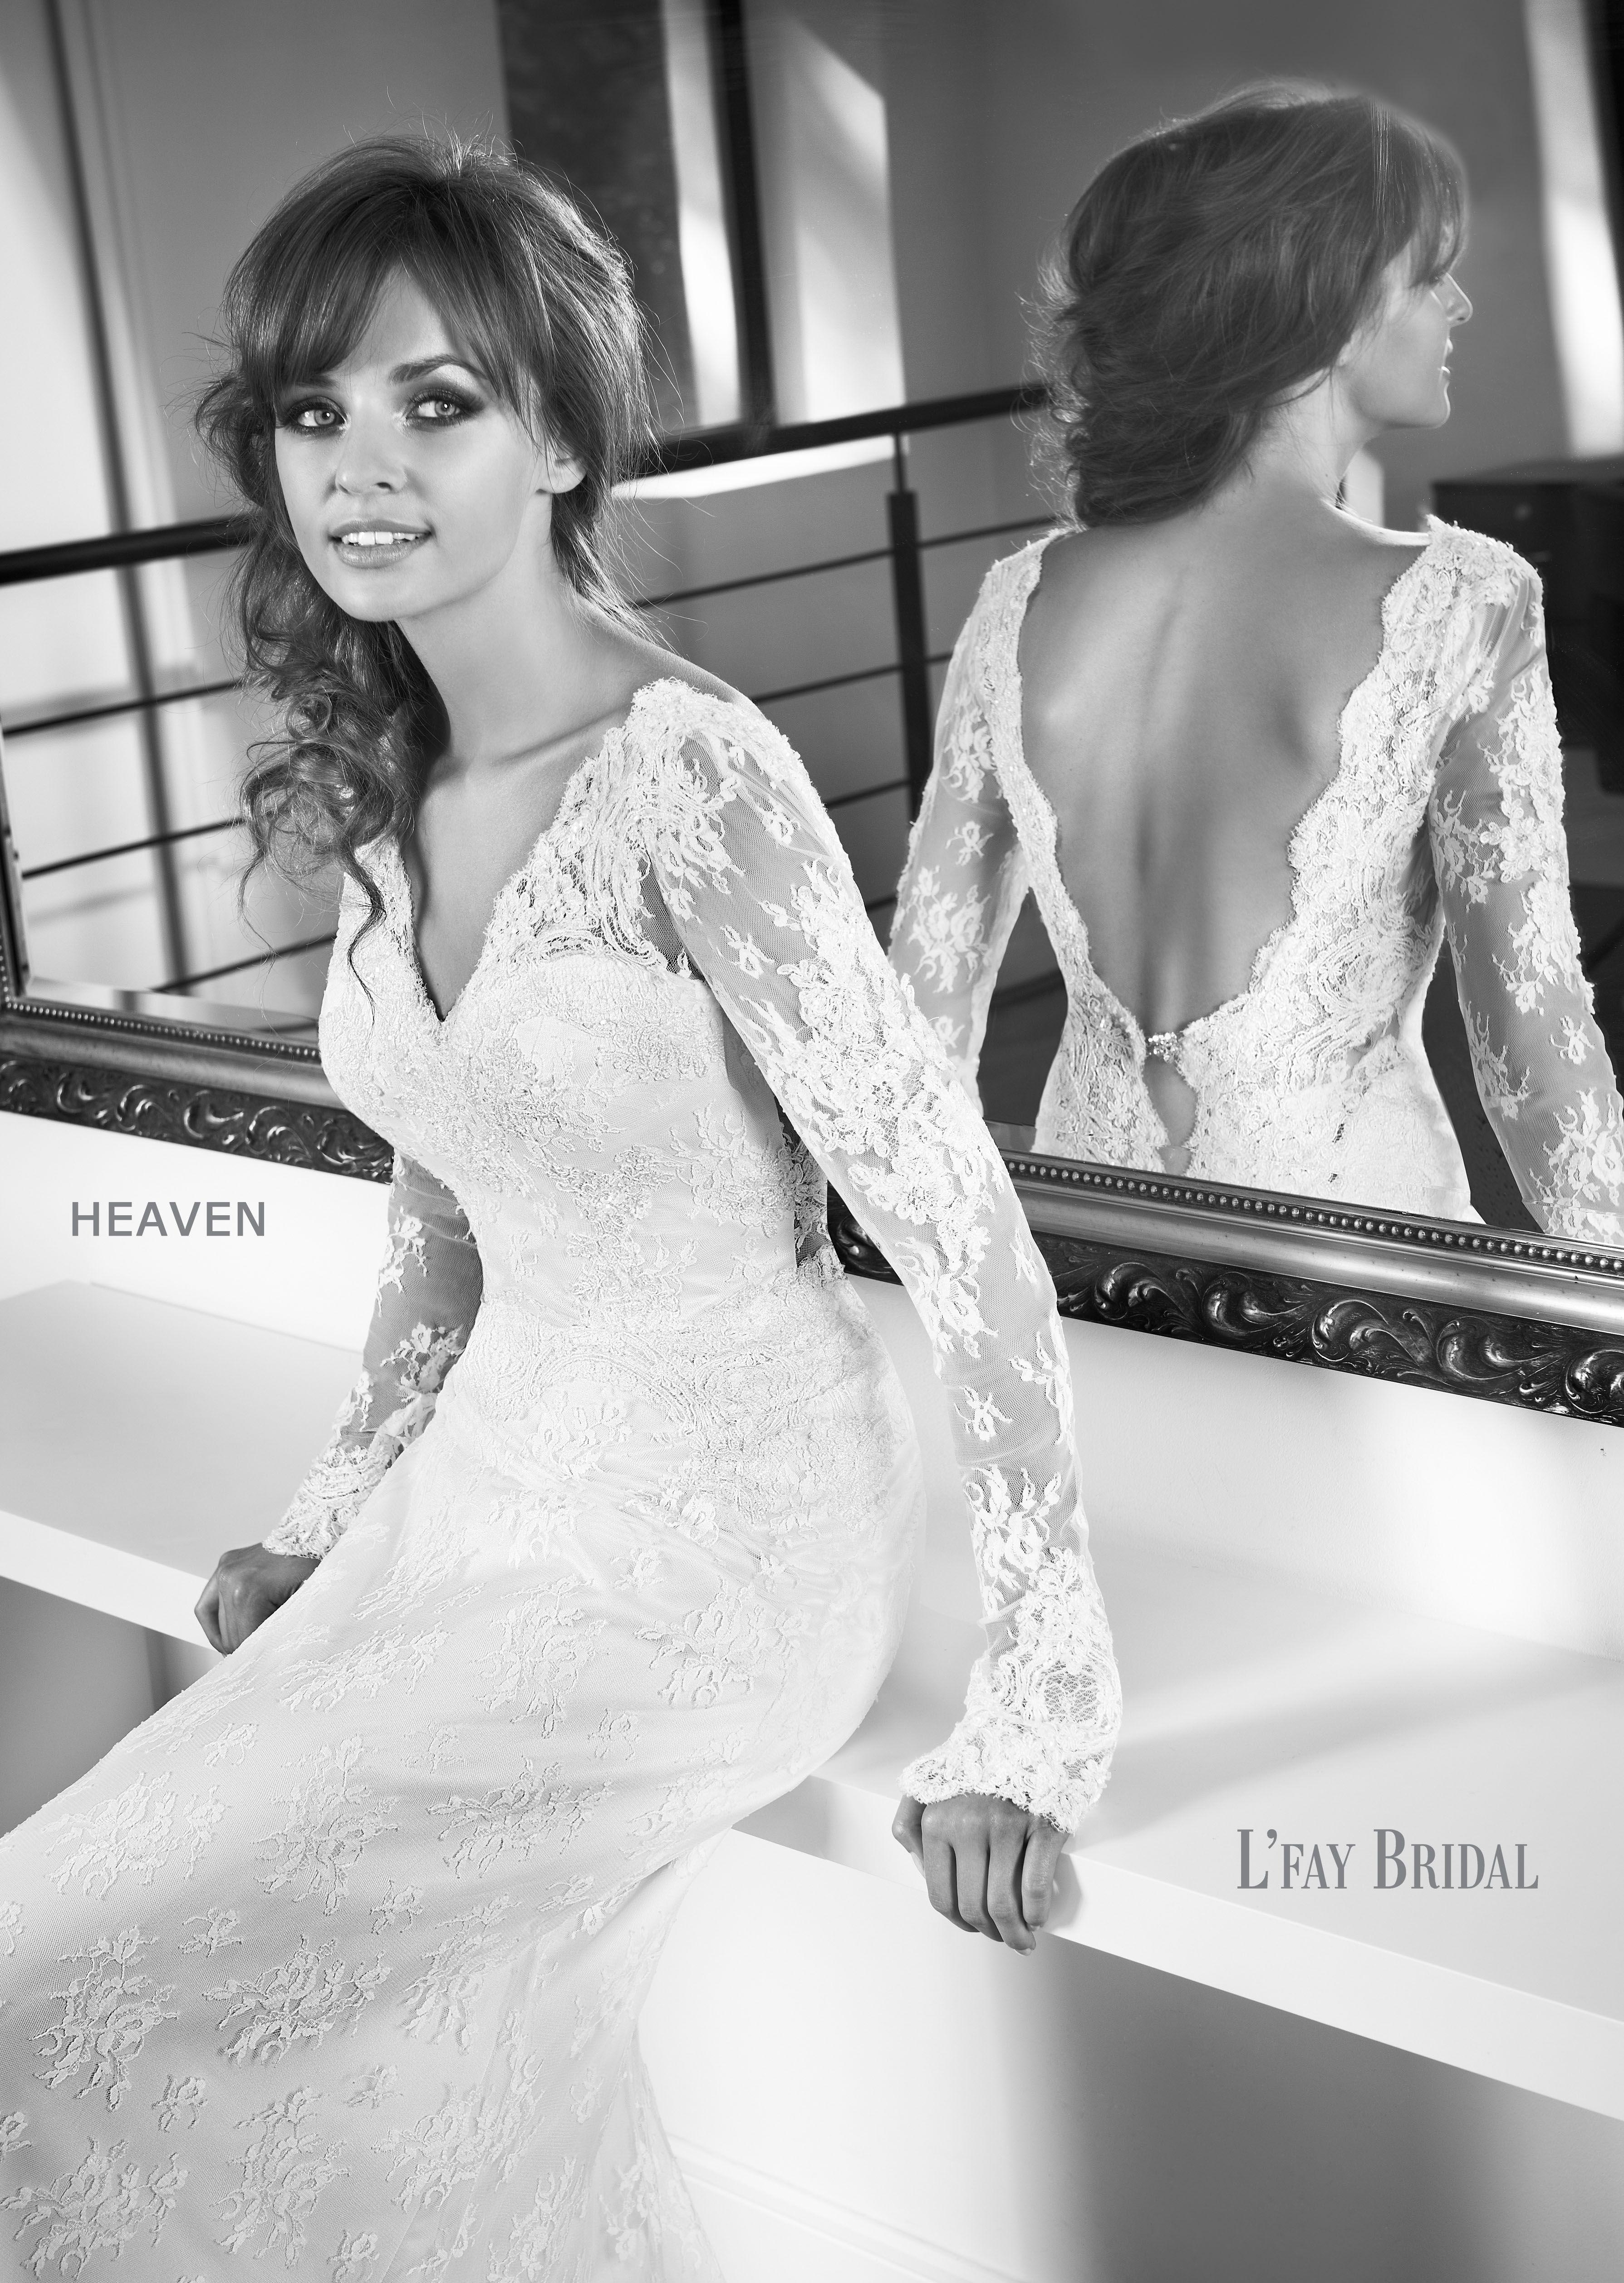 L'Fay Bridal 20   Heaven   Wedding dresses, Sophisticated ...